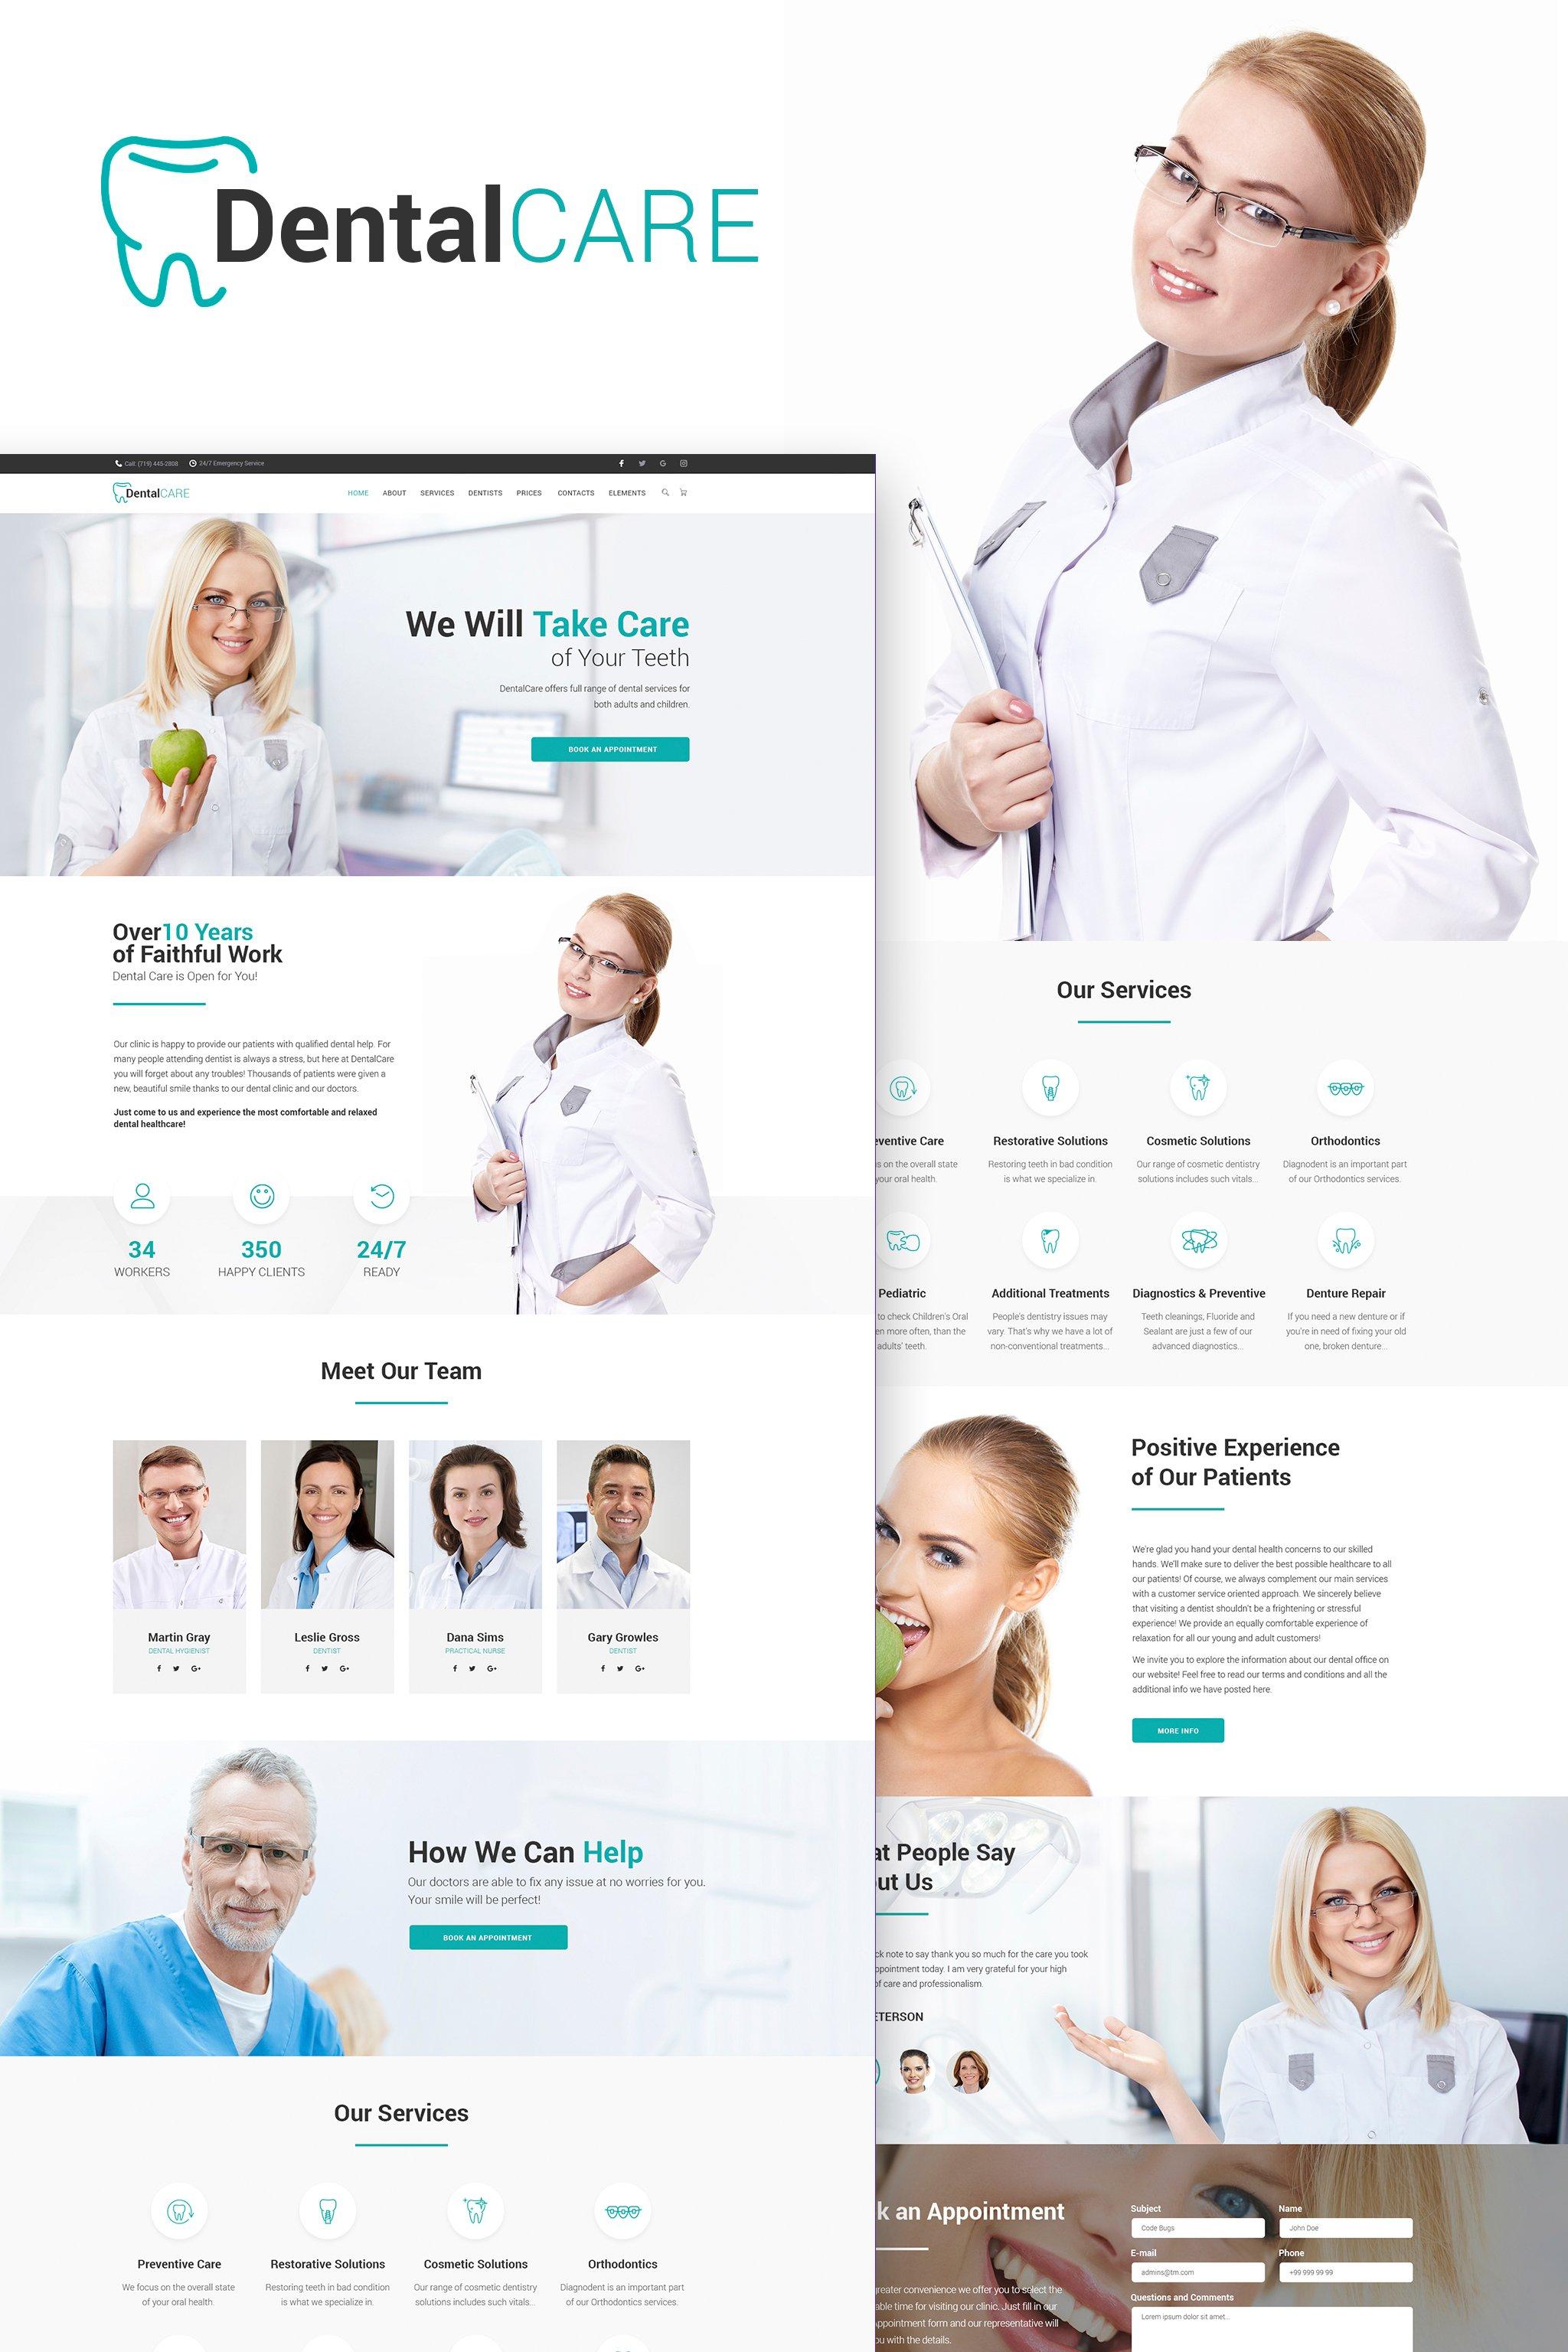 DentalCare - Dental Clinic WordPress Theme WordPress Theme